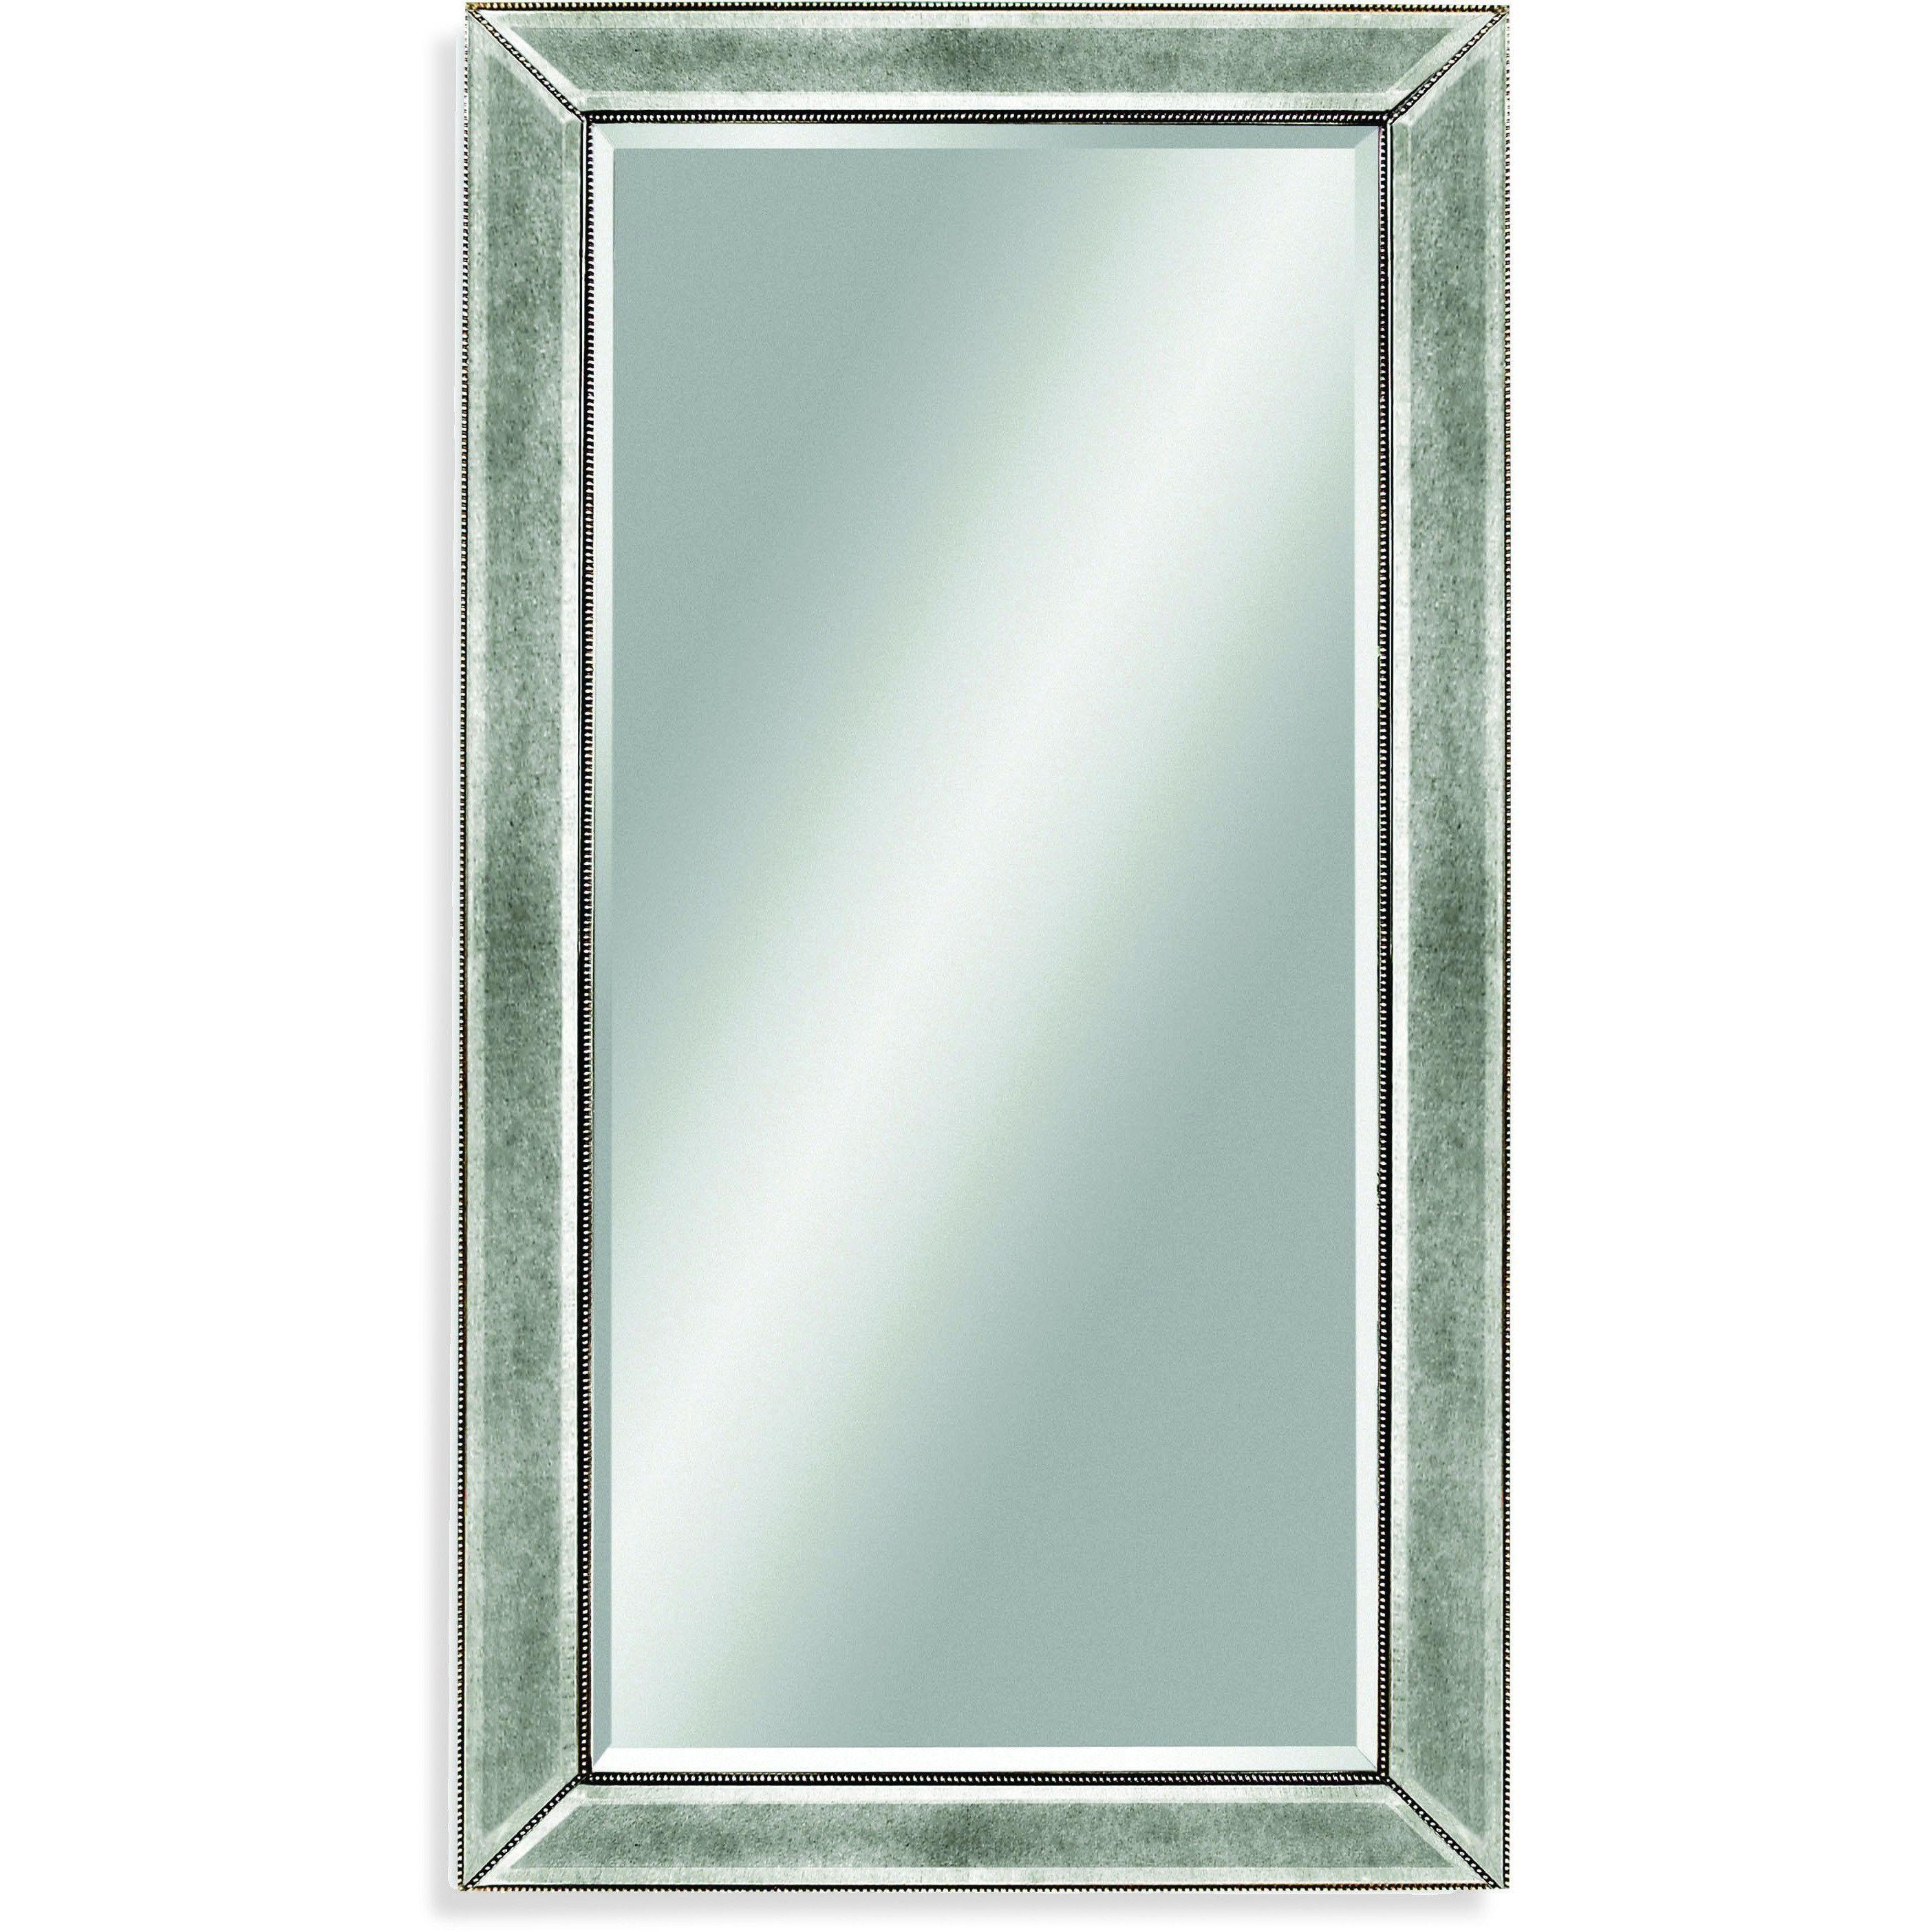 "Bassett Mirror Beaded Wall Mirror Silver Leaf 36"" x 48"" - M1946BEC"